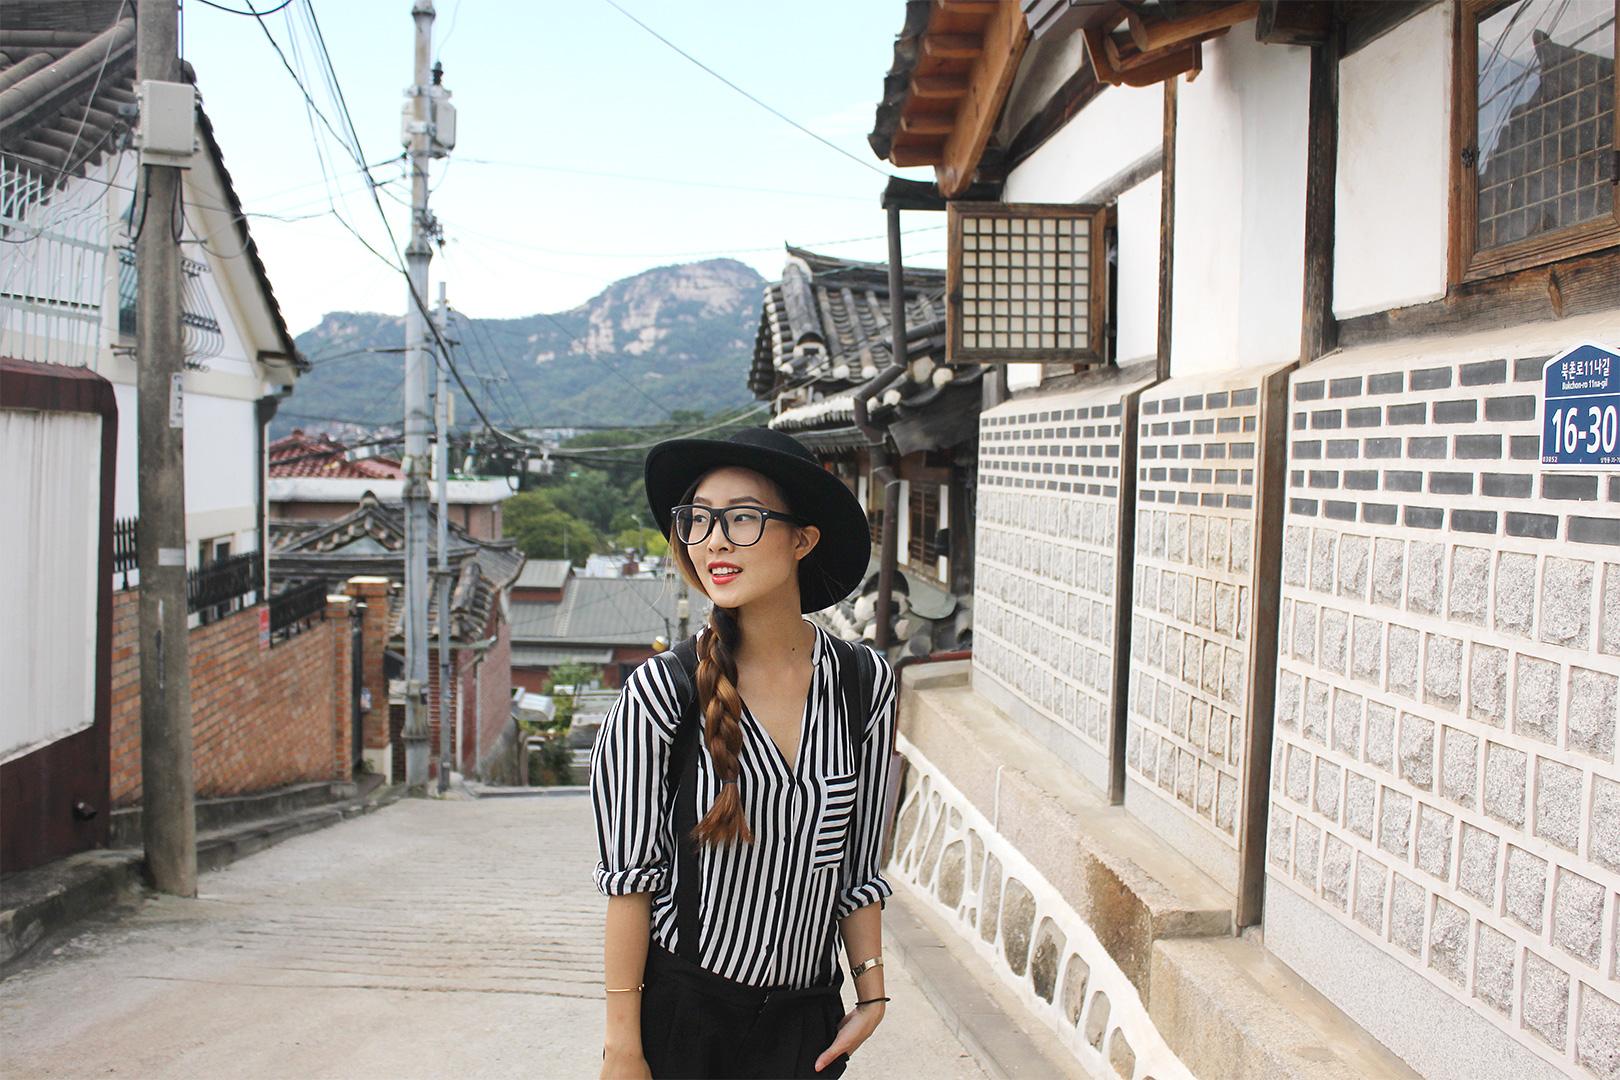 Wandering Bukchon Hanok Village